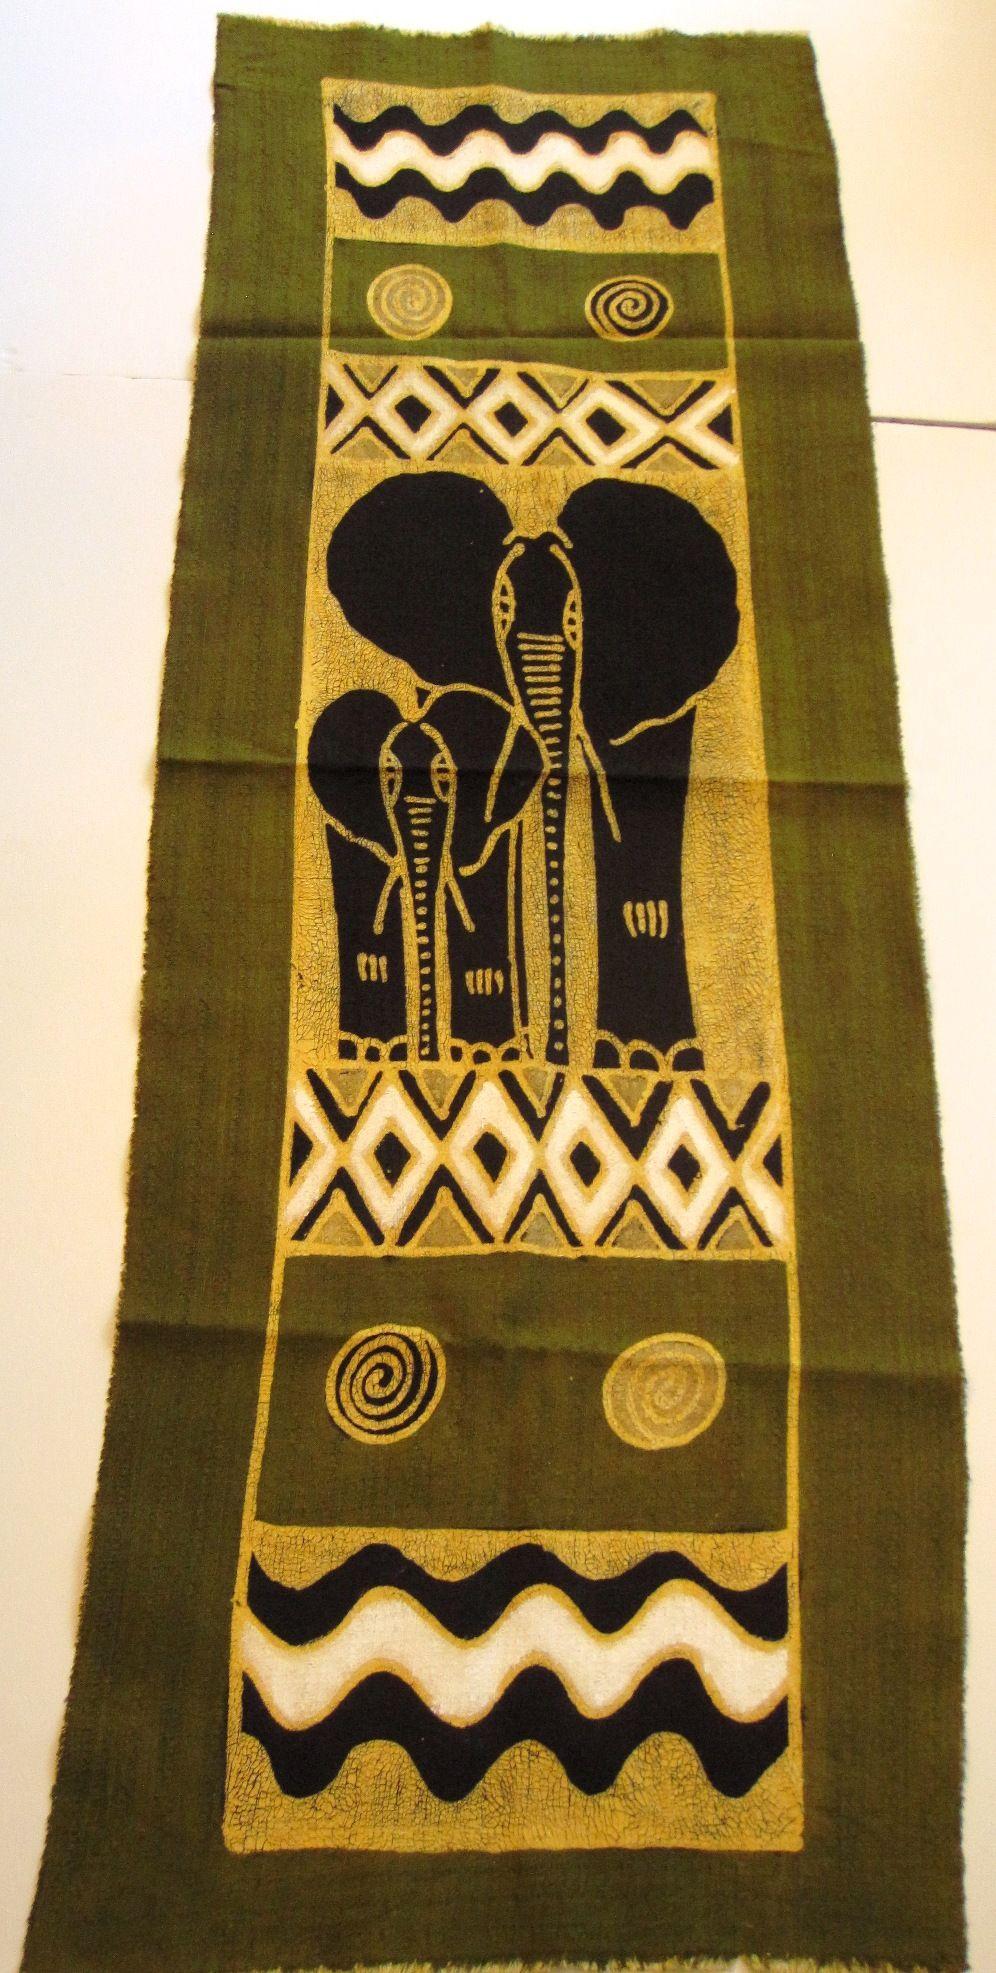 Barkweave Batik Zimbabwe | African Home Decor, Gifts and Art ...